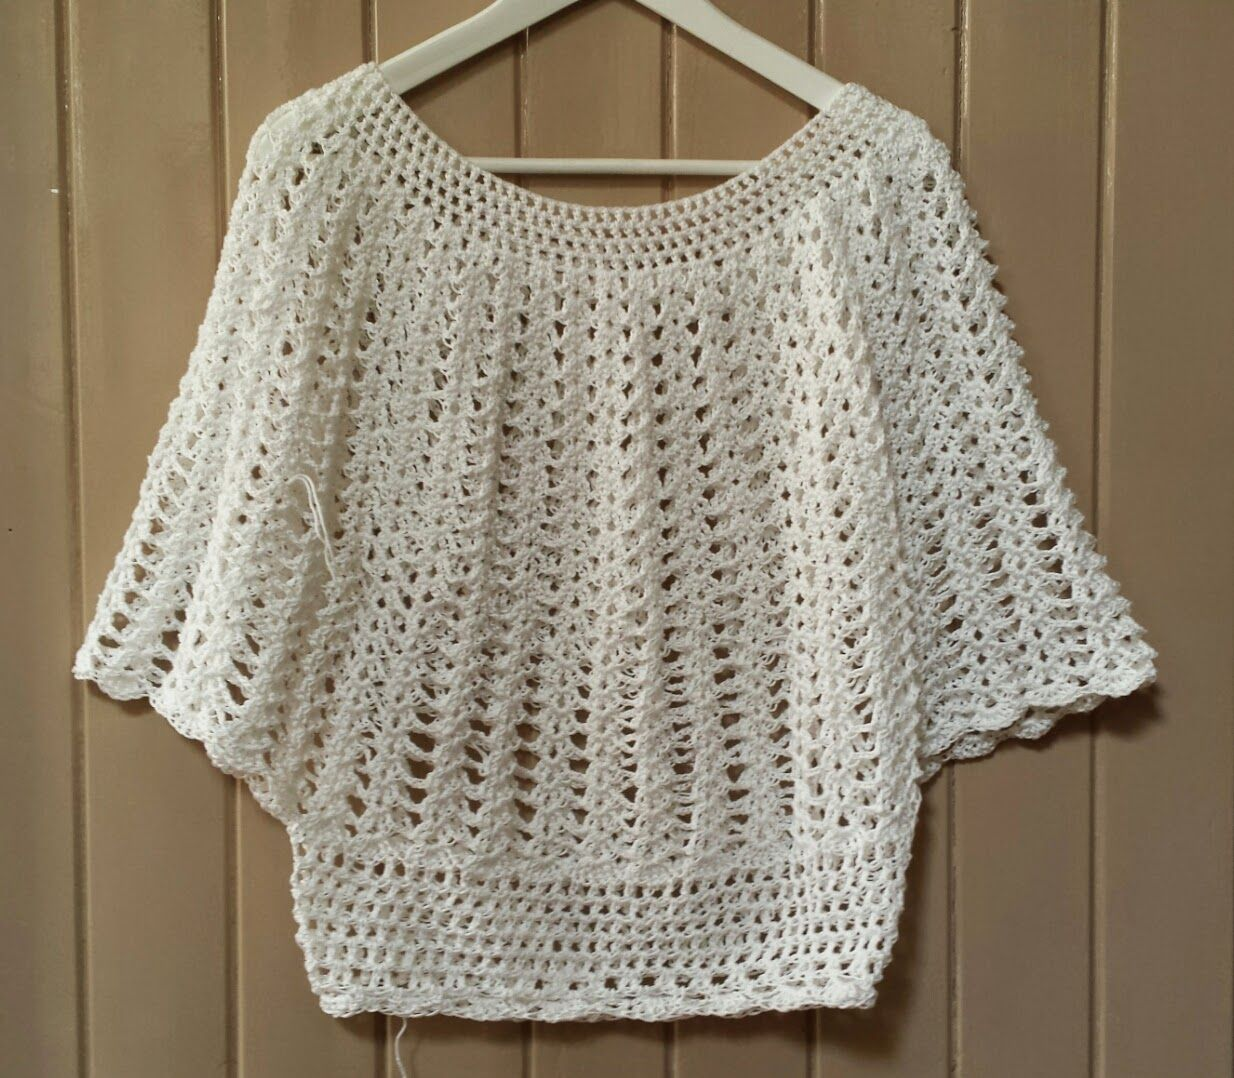 Handmade by Het Voske: Cirkel Tuniek: deel 3 | crochet | Pinterest ...